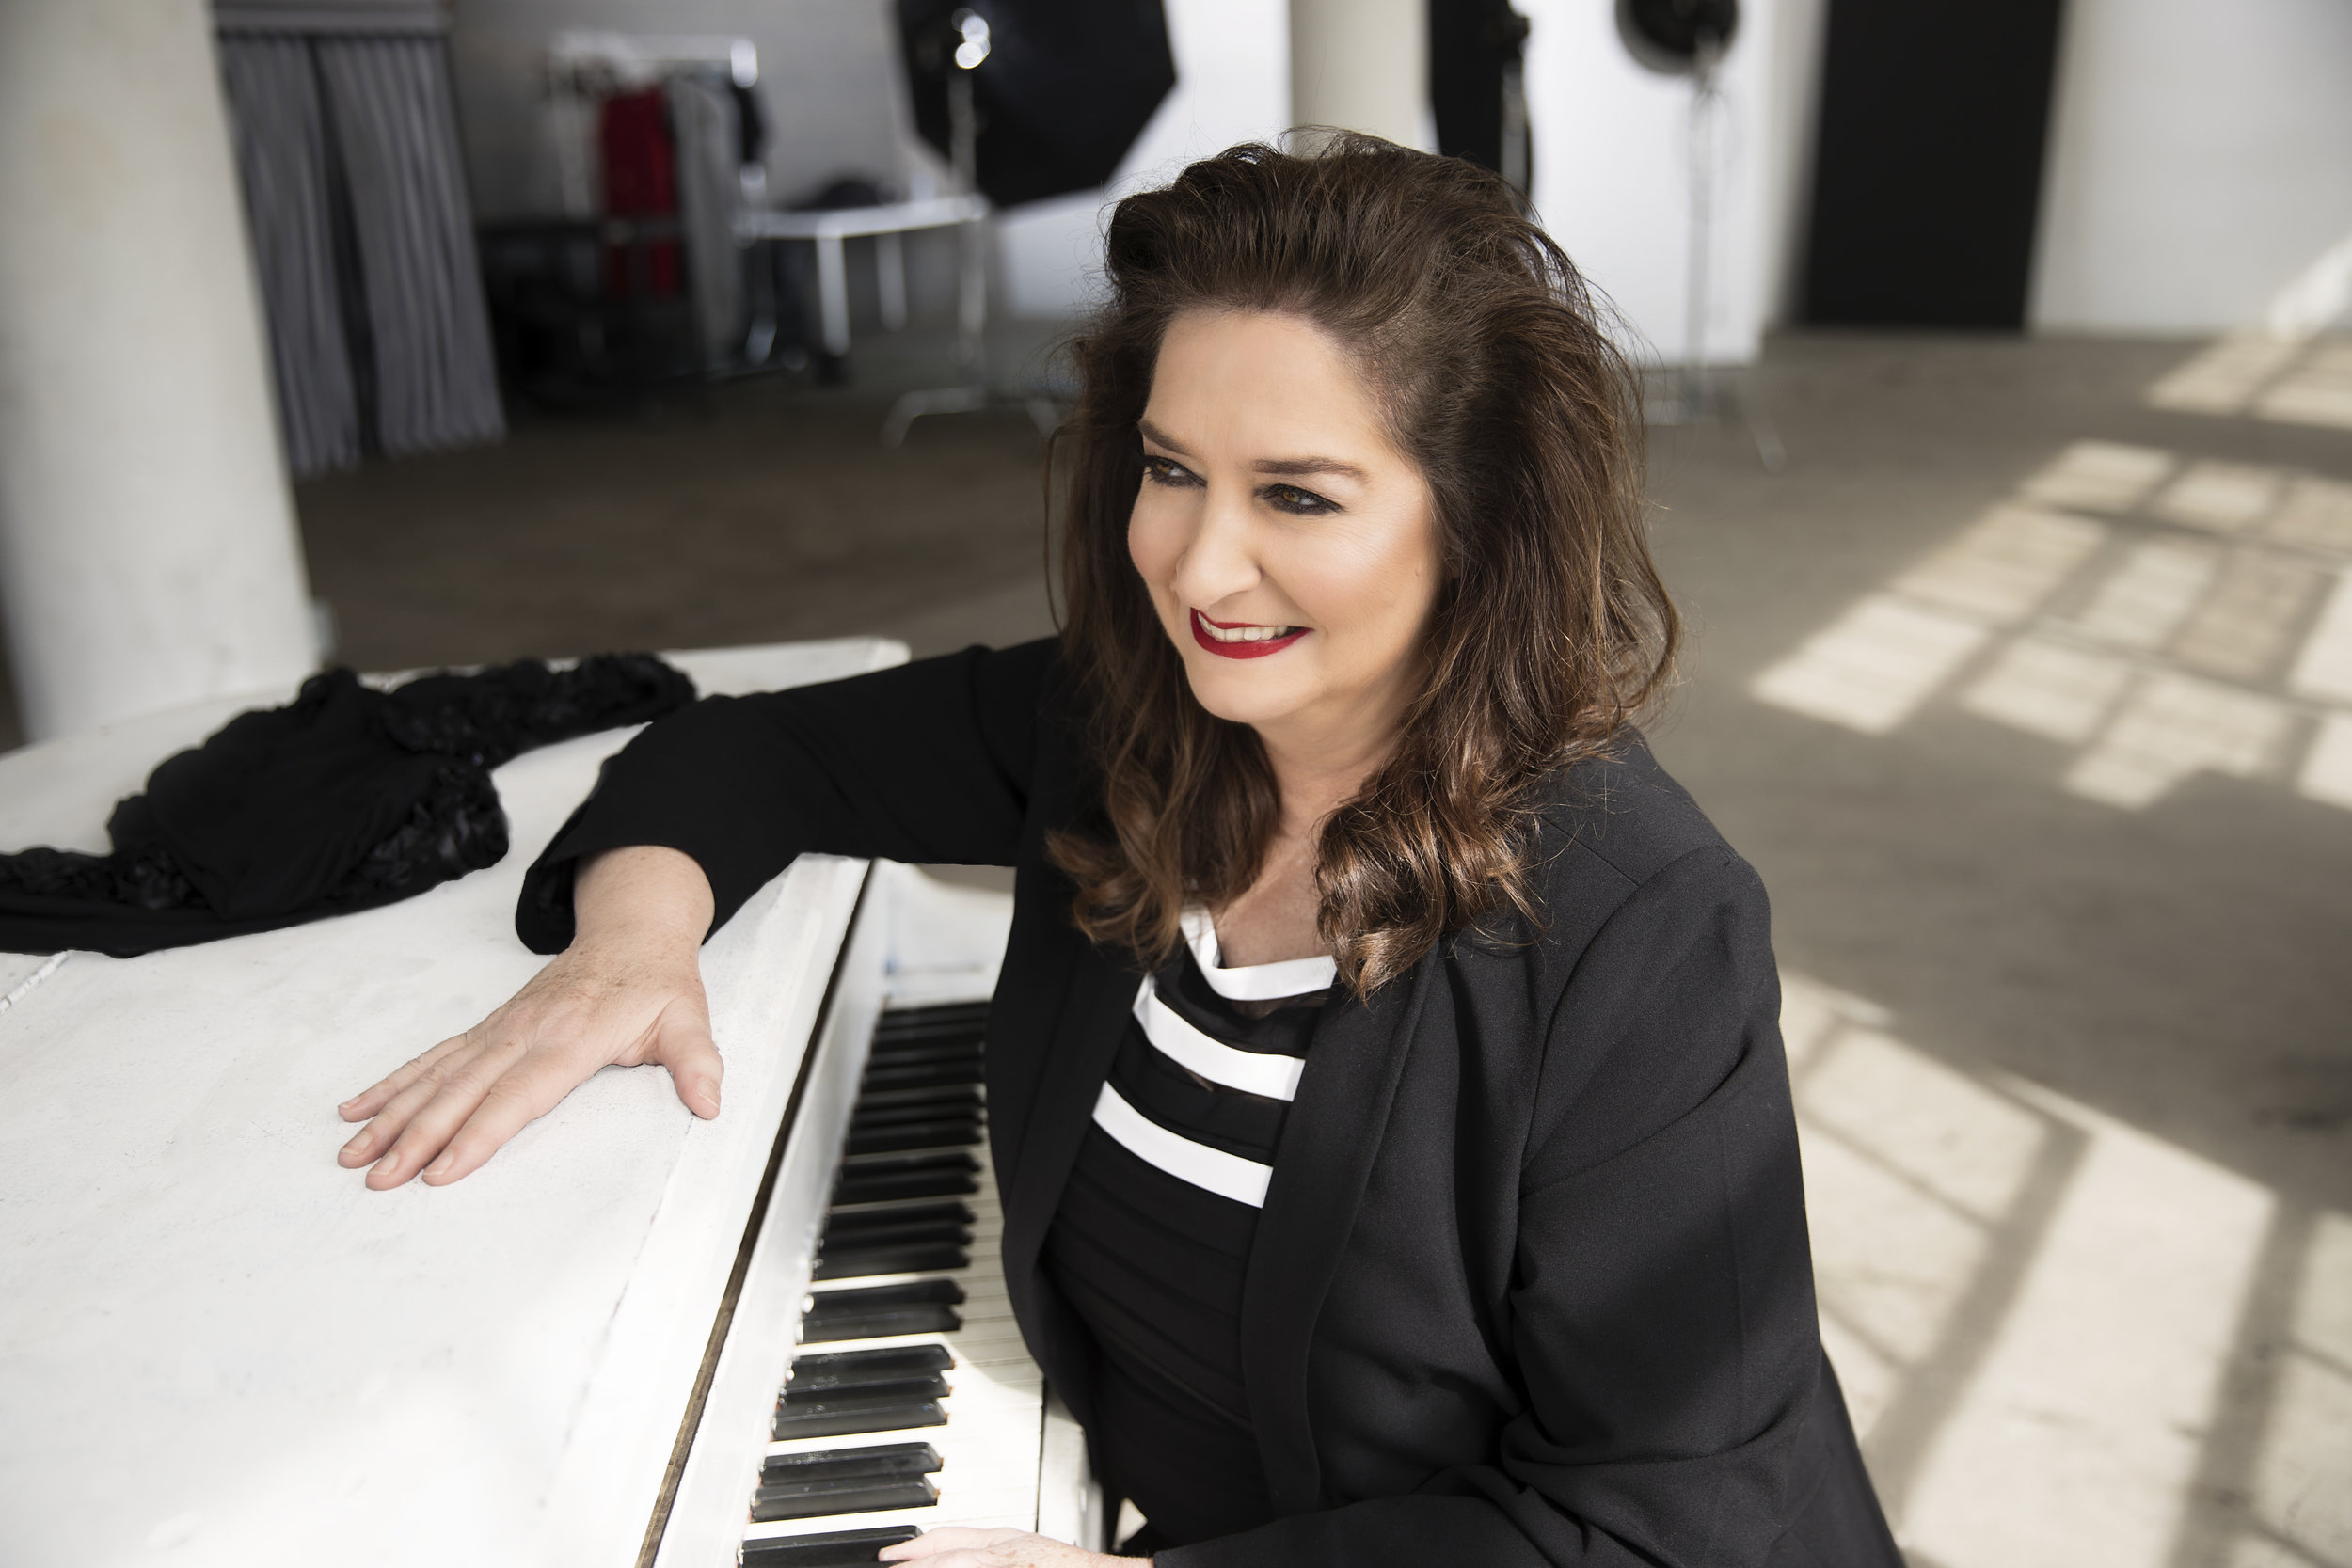 Valerie Fahren, singer-songwriter and actor